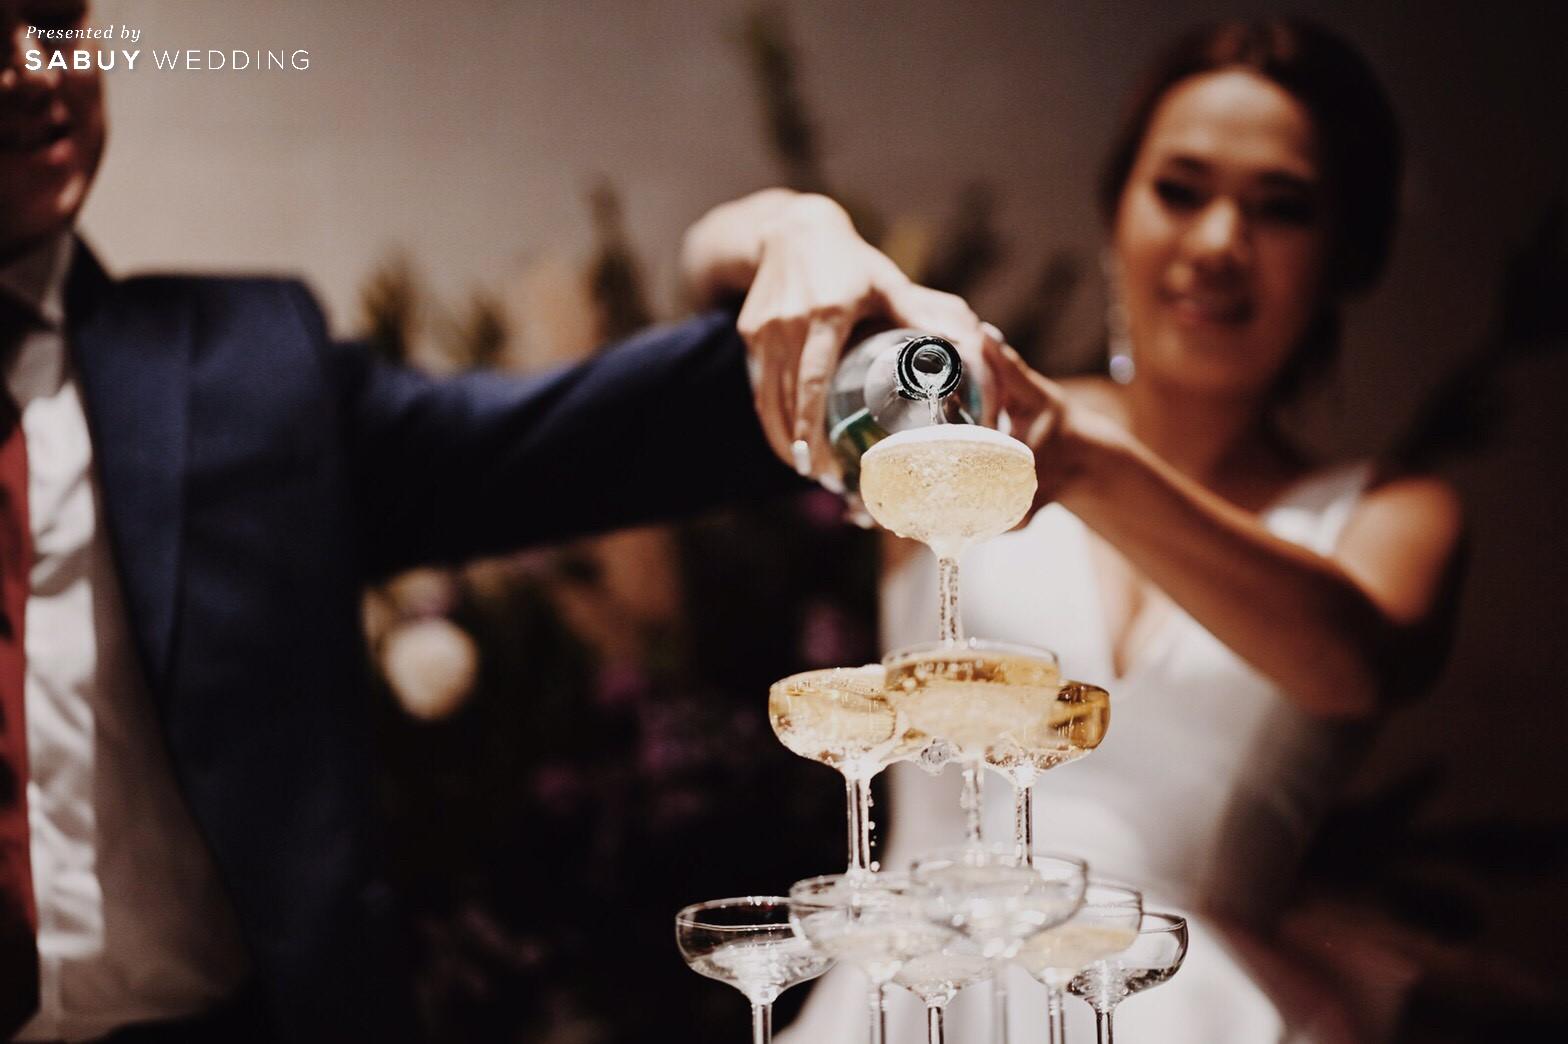 All day wedding ceremony เนรมิตงานแต่งสวยครบ จบในที่เดียว @ Bliston Suwan Park View Hotel